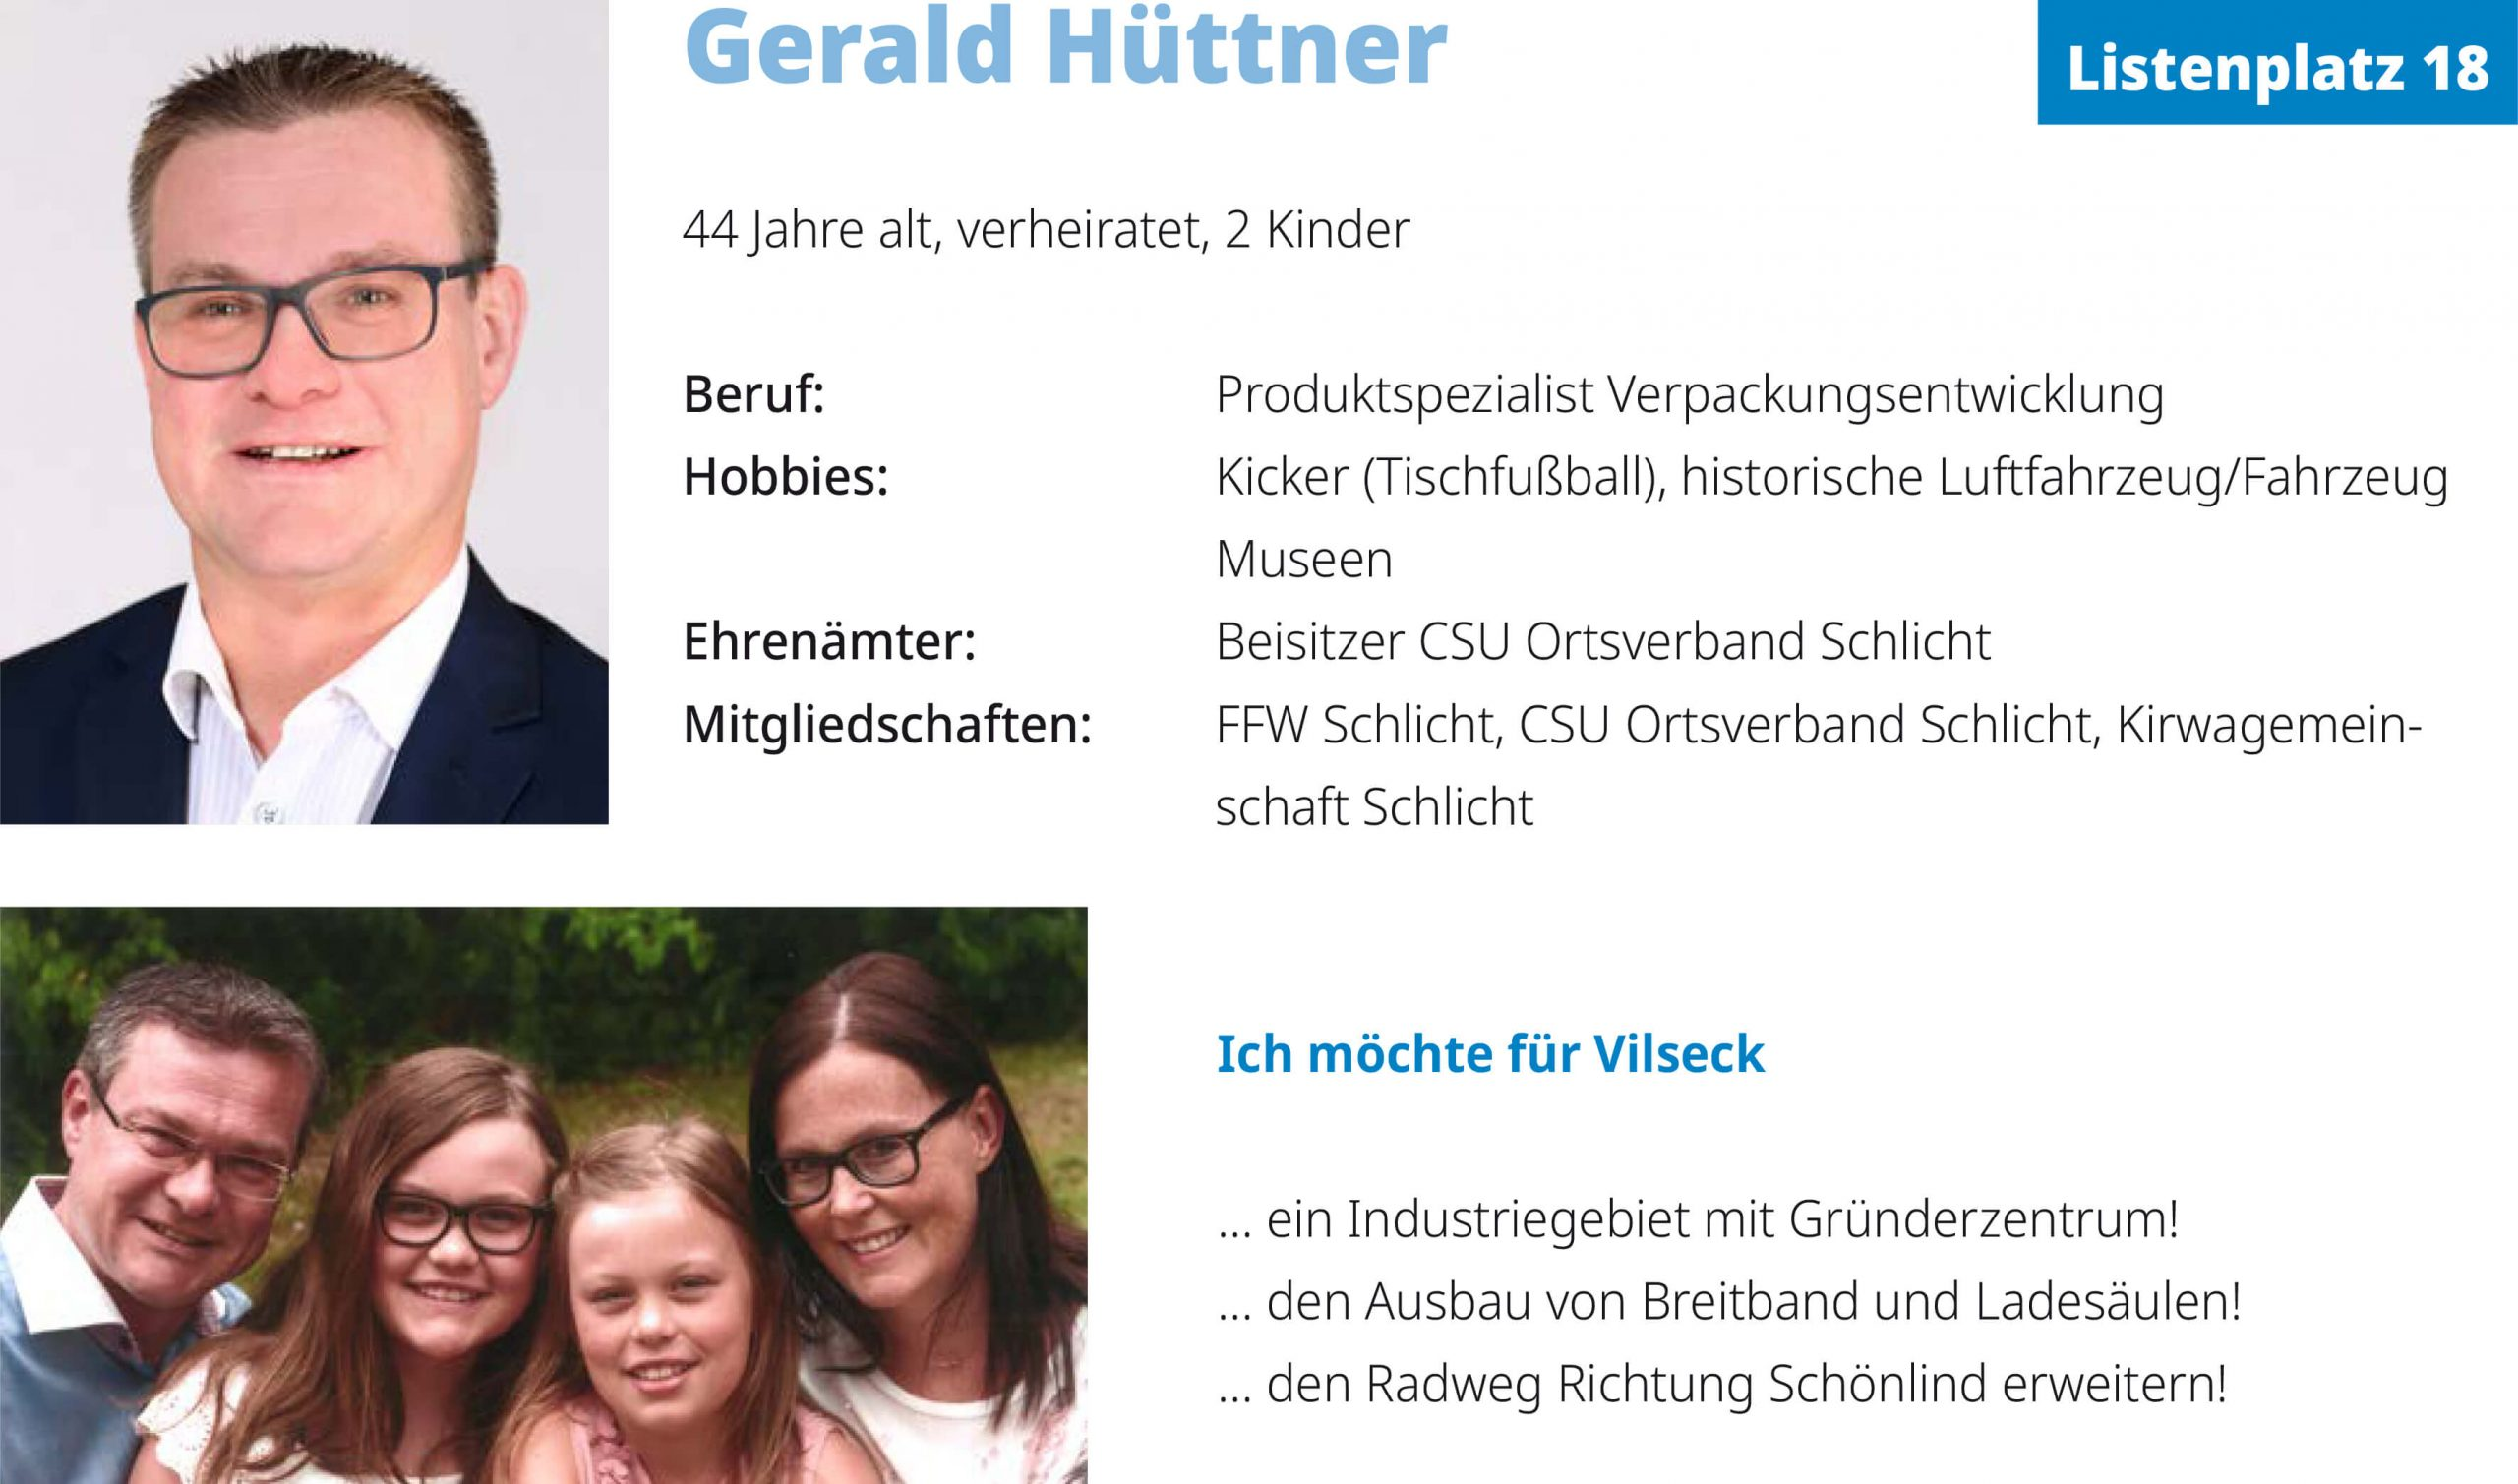 Gerald Hüttner